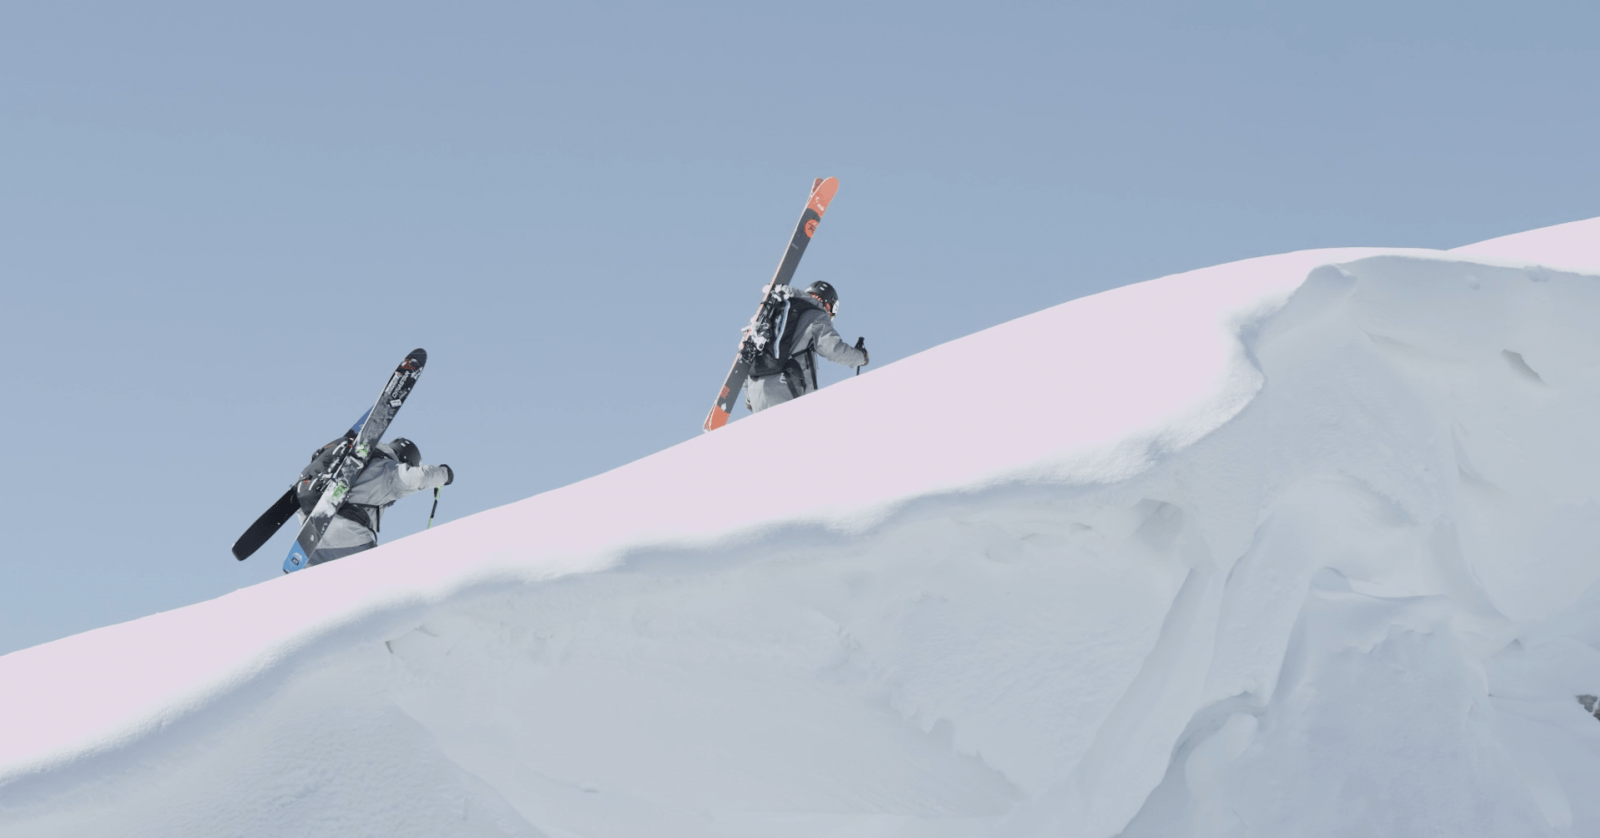 La magie de skier en Inde : LE CÔTÉ SAUVAGE de Mario Gattinger